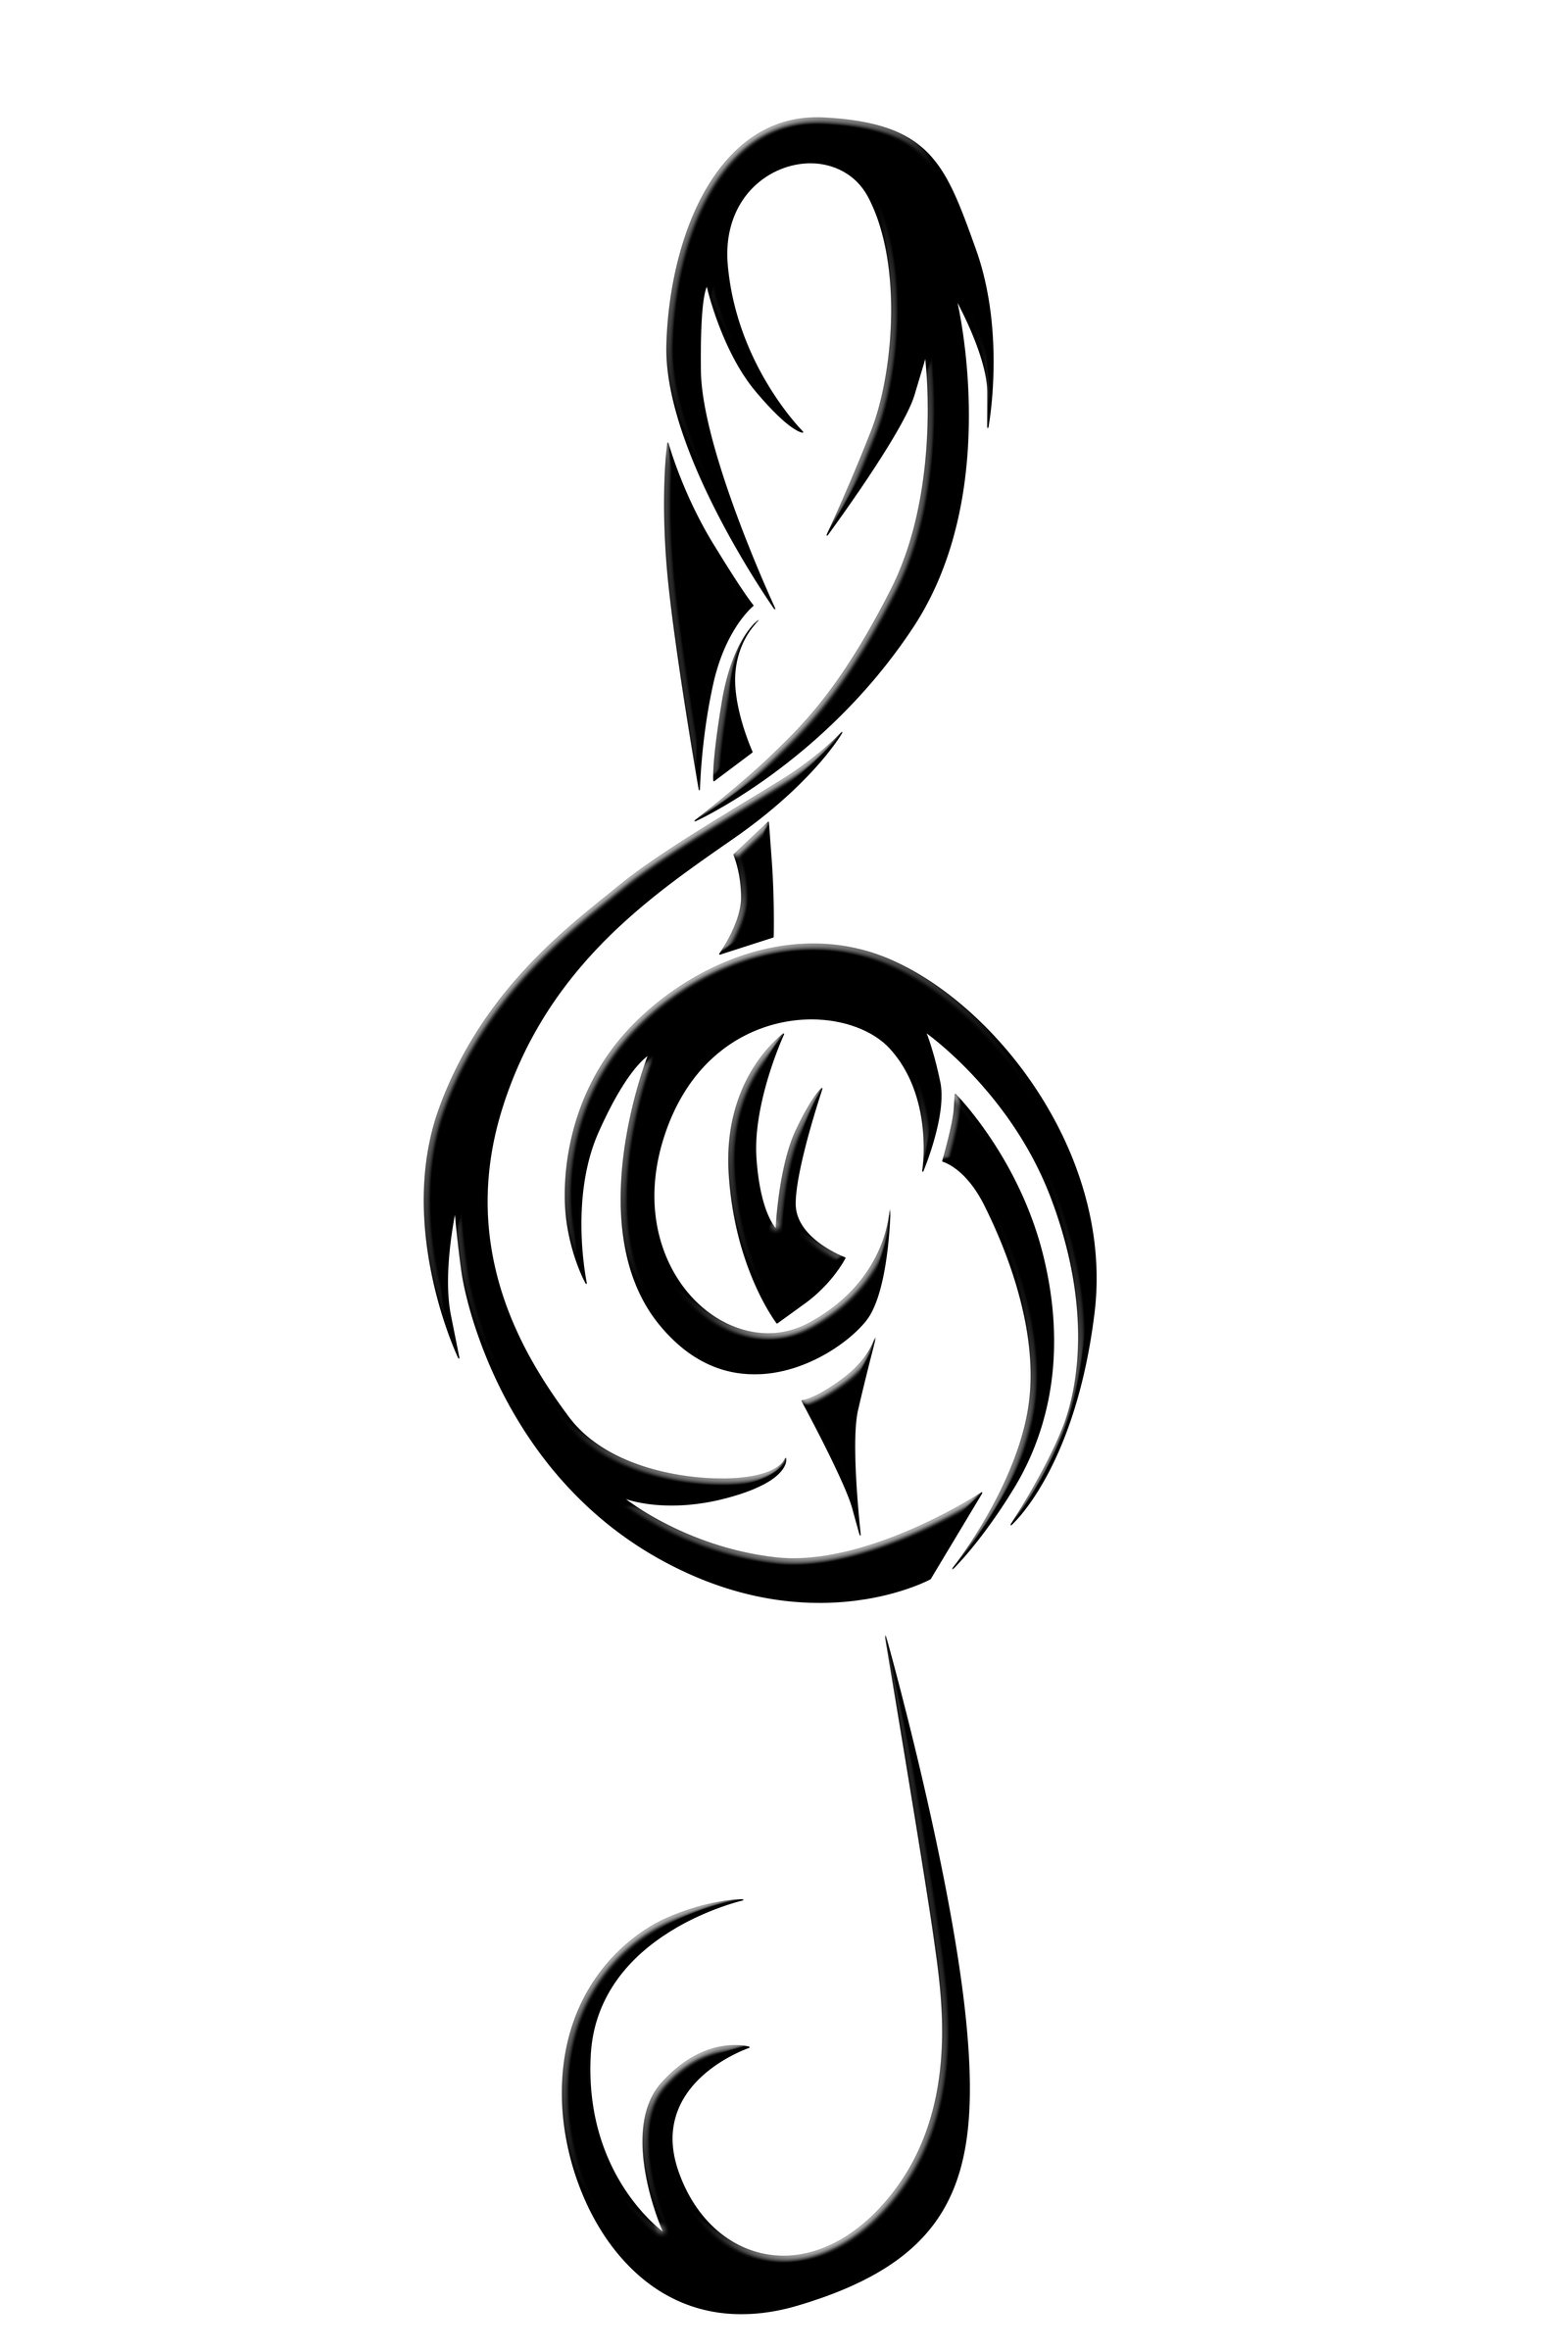 1600x2400 Pin By Linda Samuelson On Music Tattoo Ideas Treble